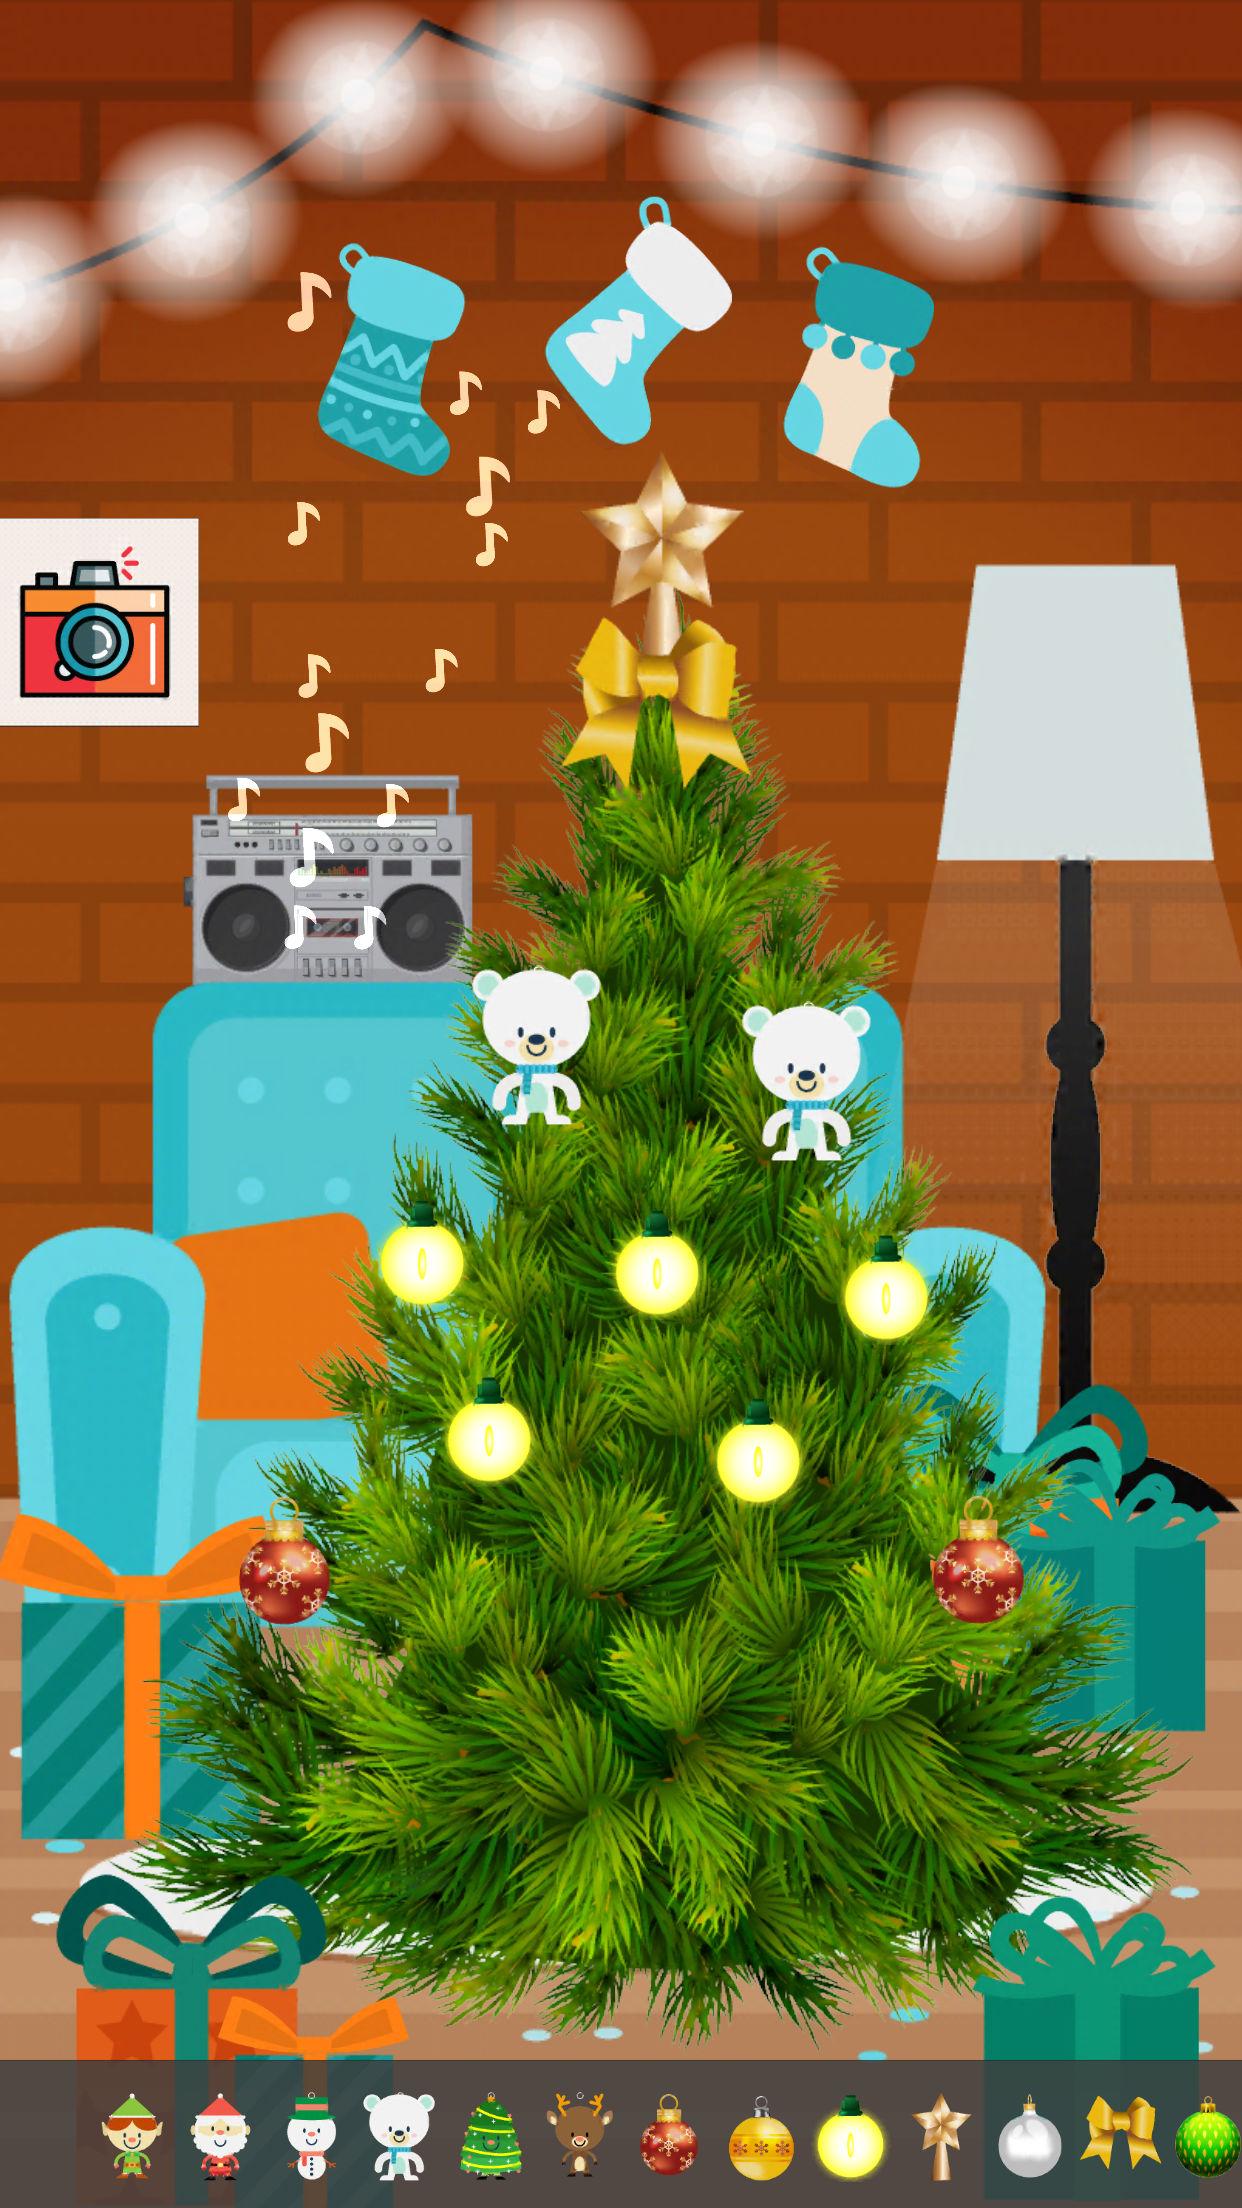 Own Christmas Tree